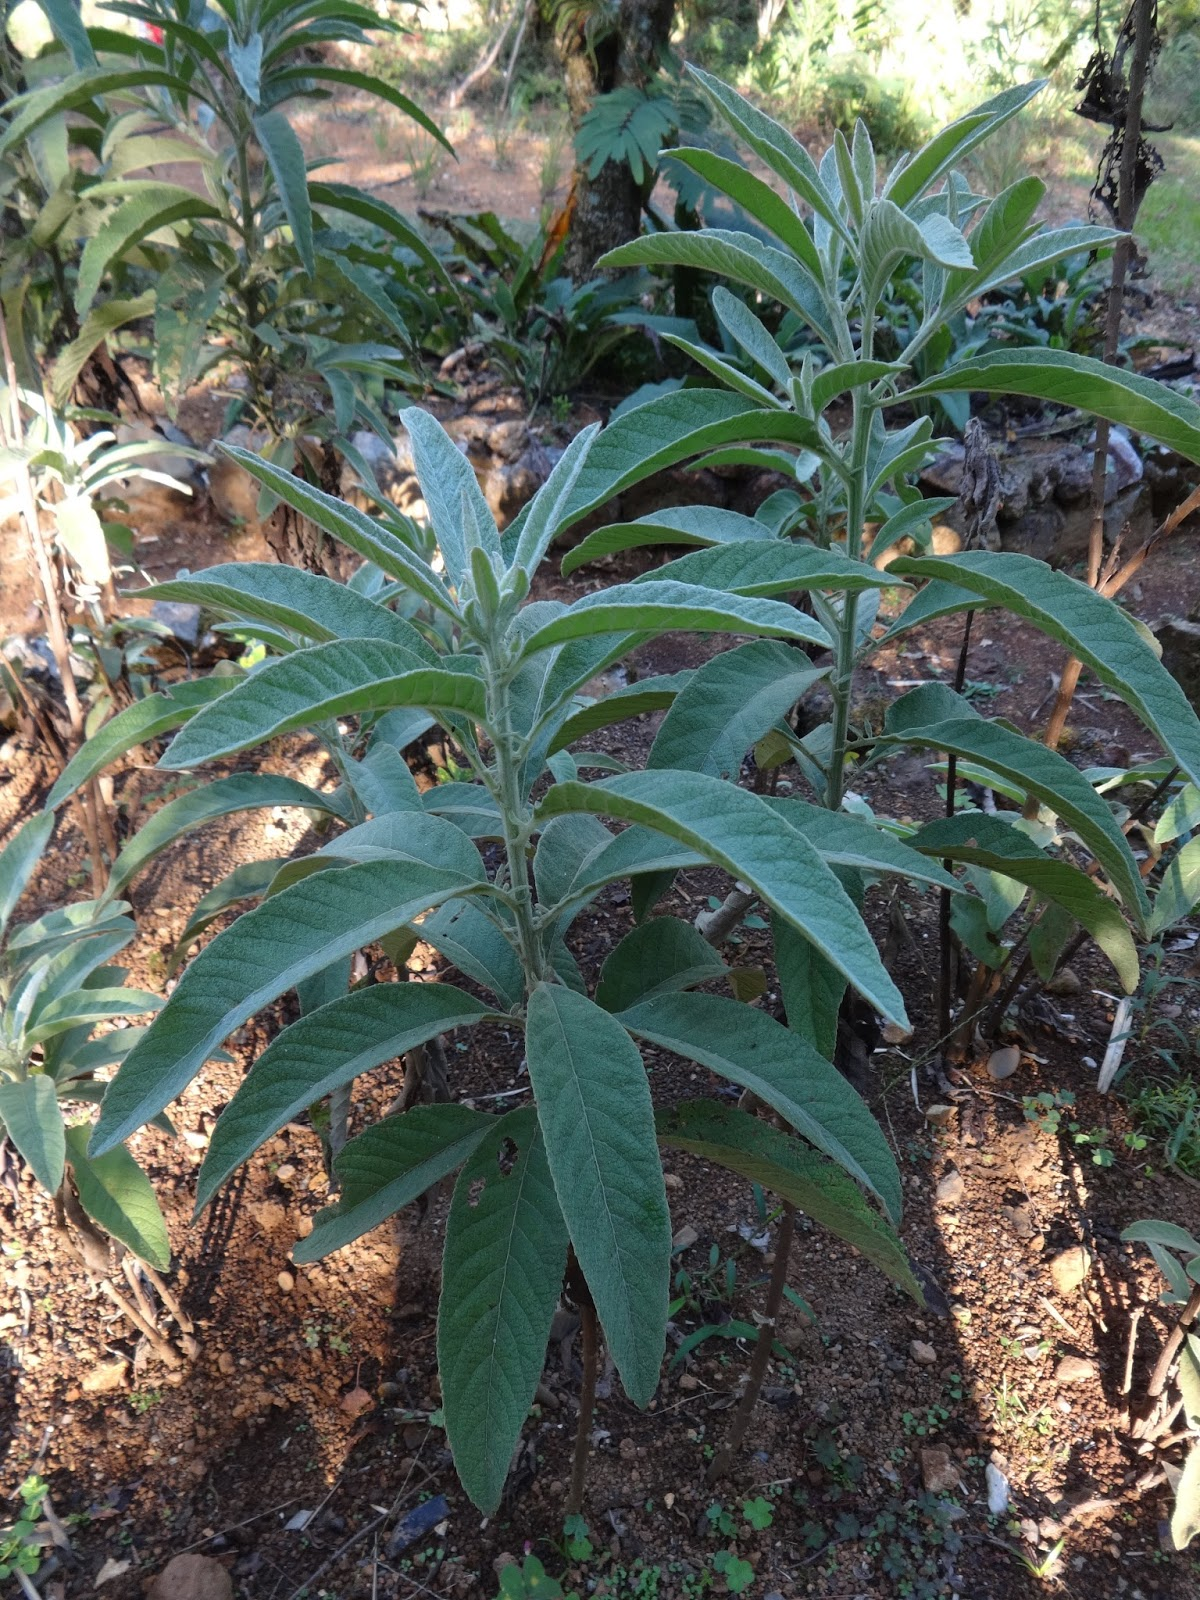 Herbs from Distant Lands: Blumea balsamifera - Ngai Camphor